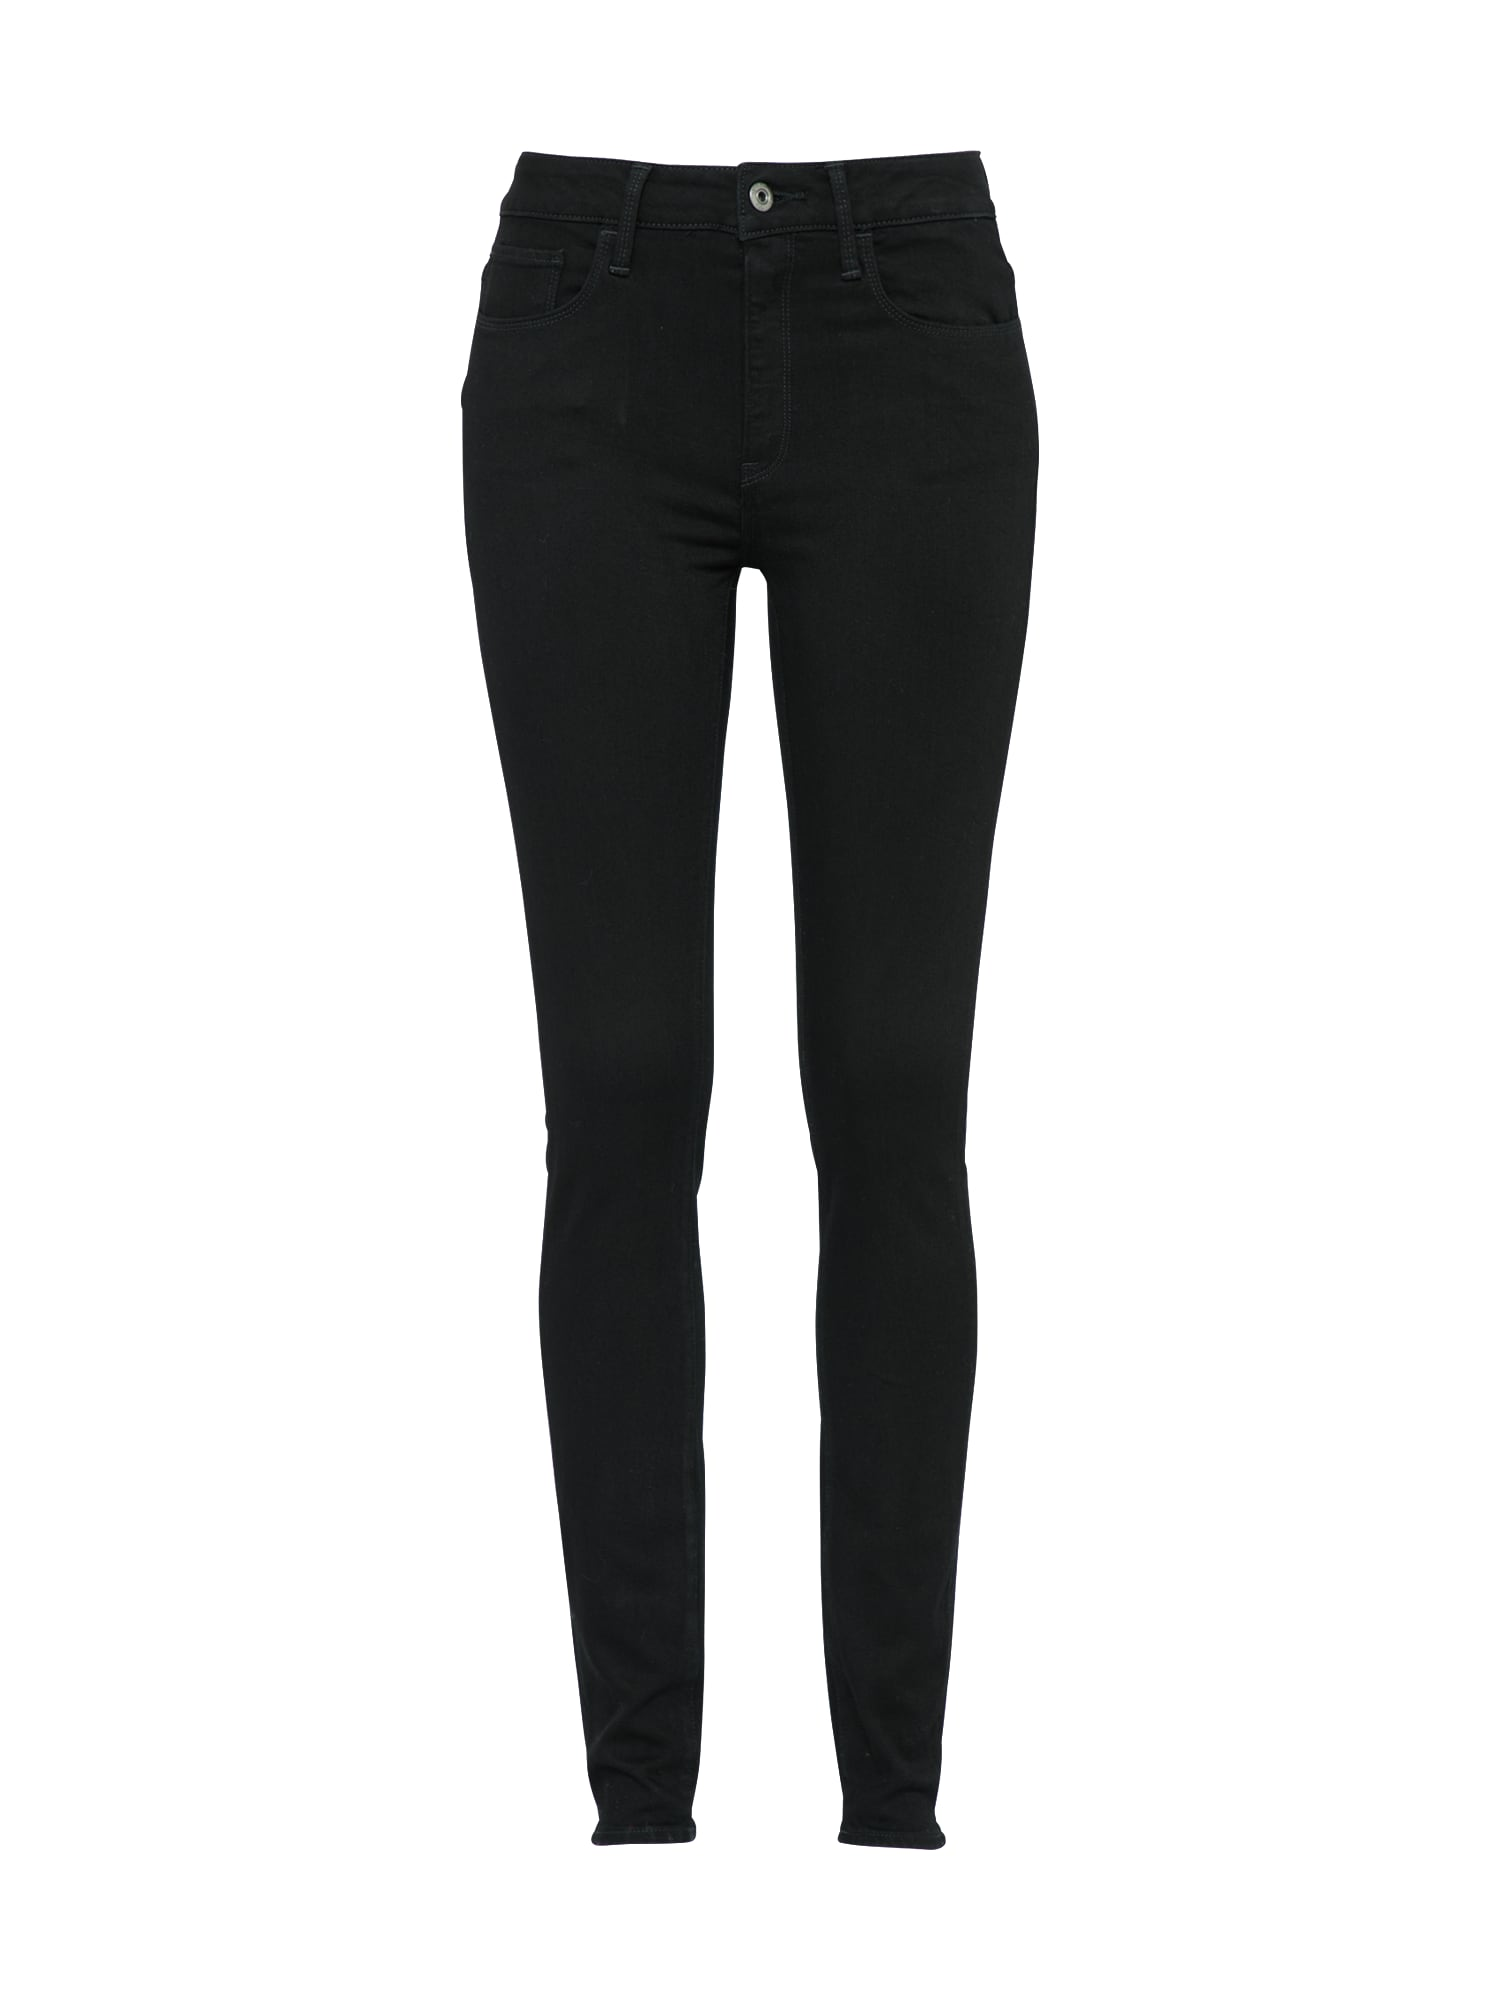 G-STAR RAW Dames Jeans 3301 Deconst black denim